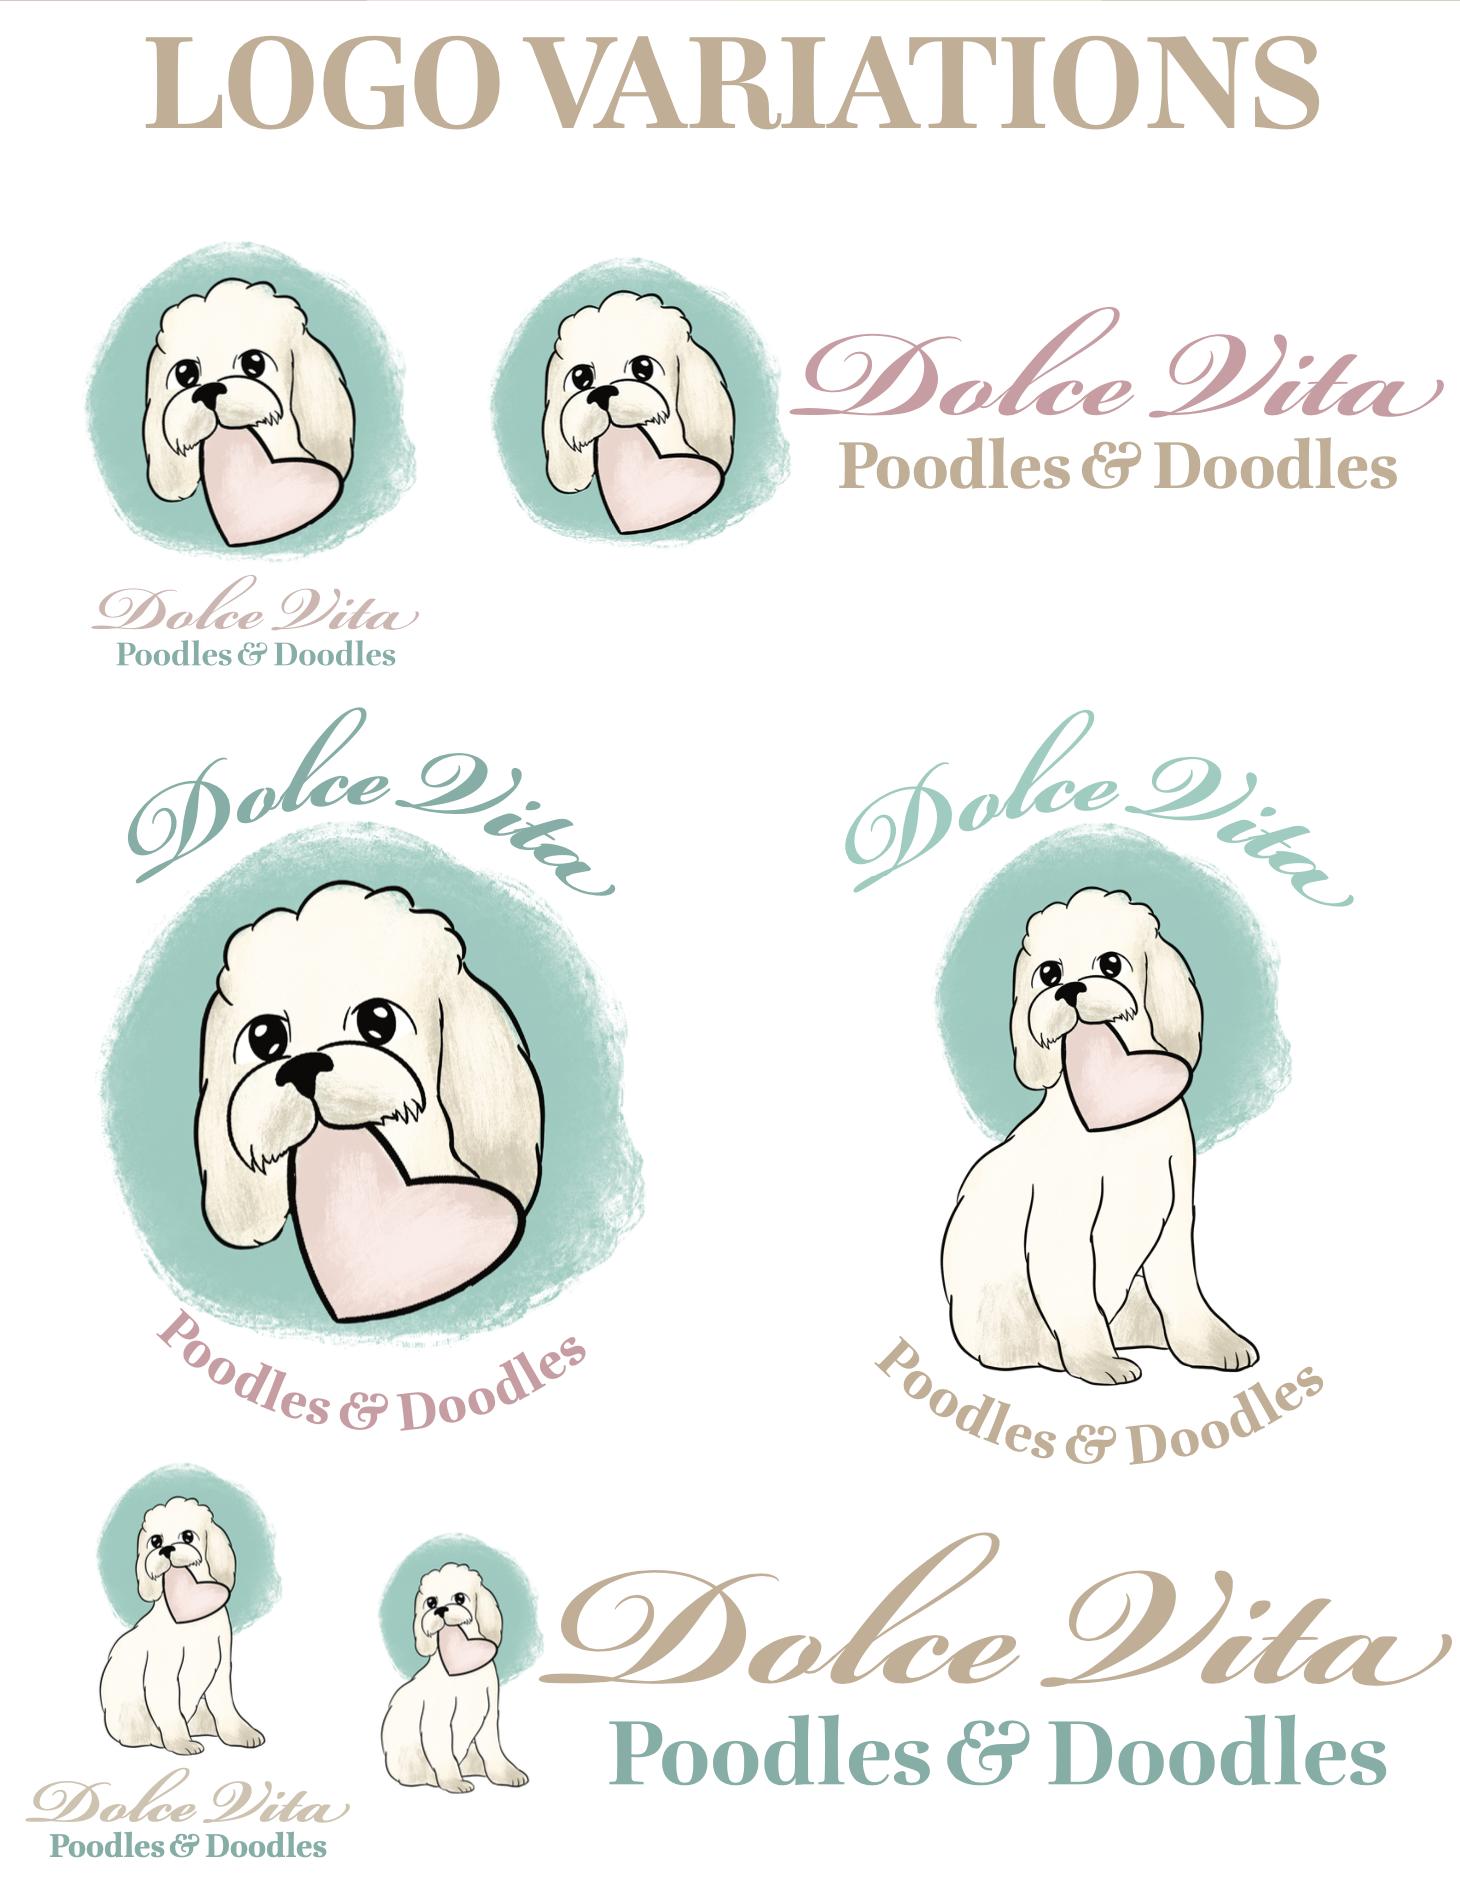 Dolce Vita Logo Variations